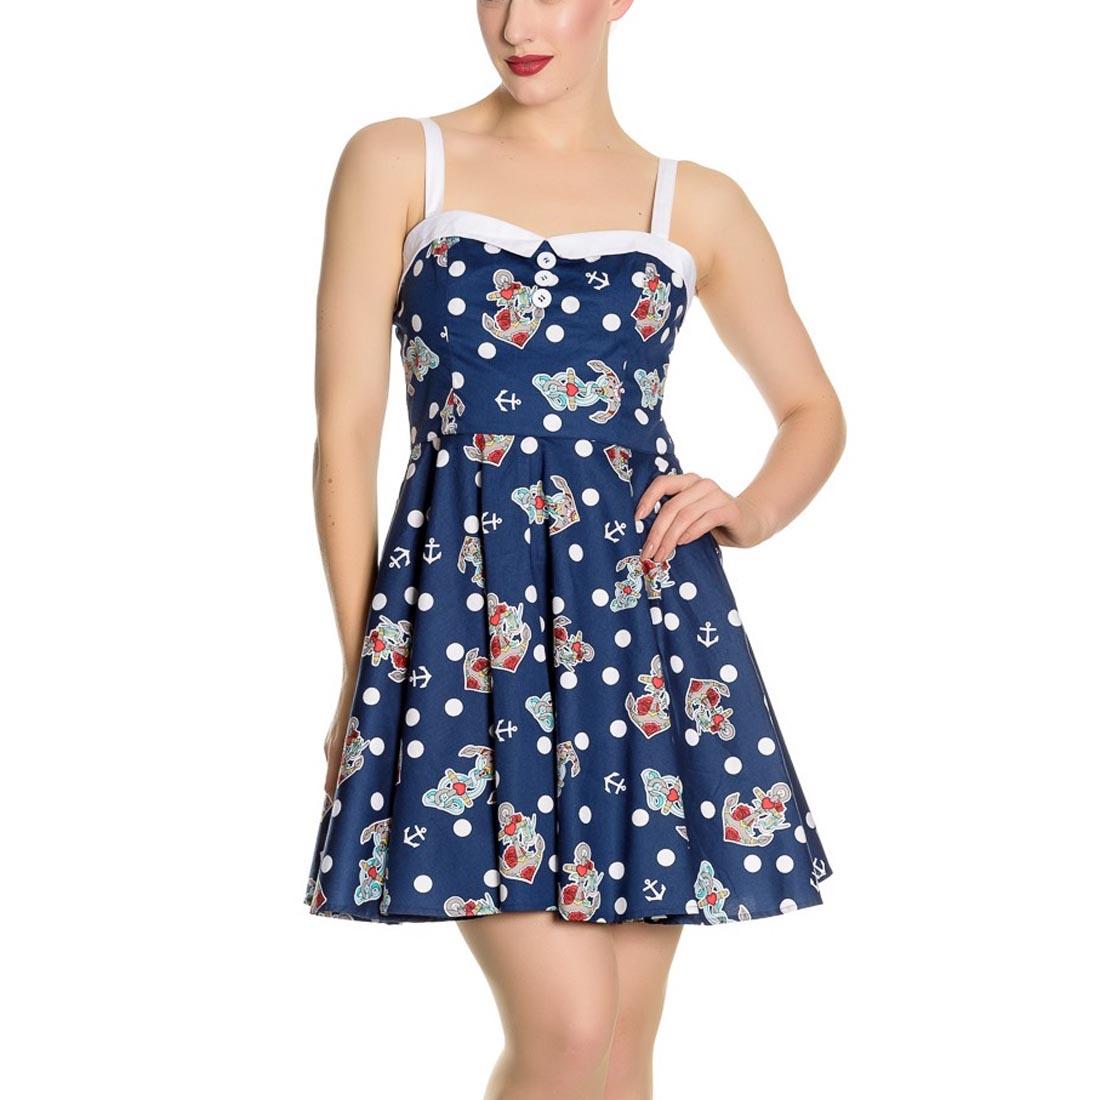 Hell-Bunny-Navy-Blue-50s-Nautical-Mini-Dress-OCEANA-Polka-Dot-All-Sizes thumbnail 7